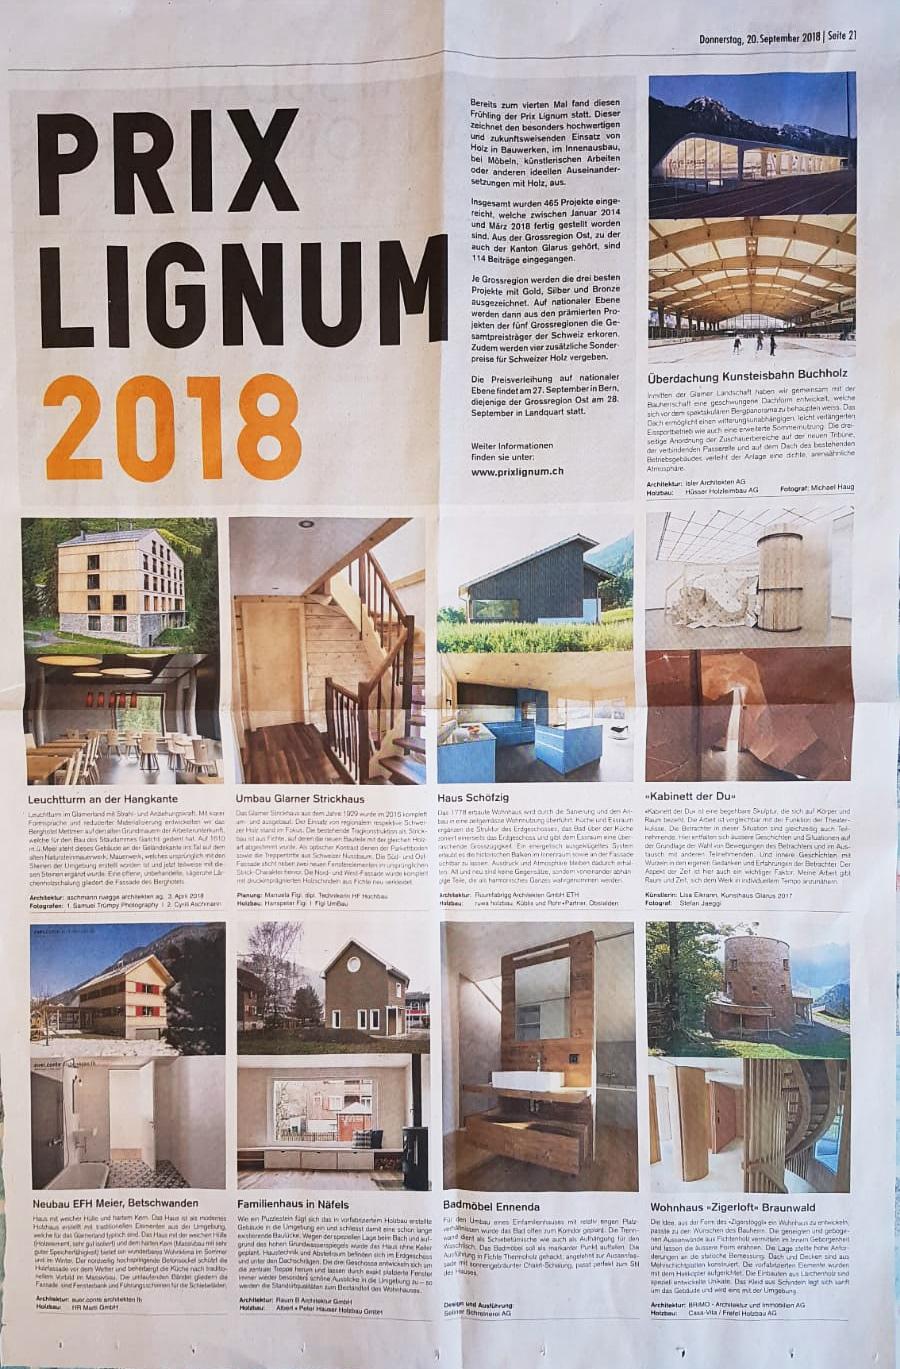 26. Sep 2018 -  Haus Schöfzig  - Prix Lignum